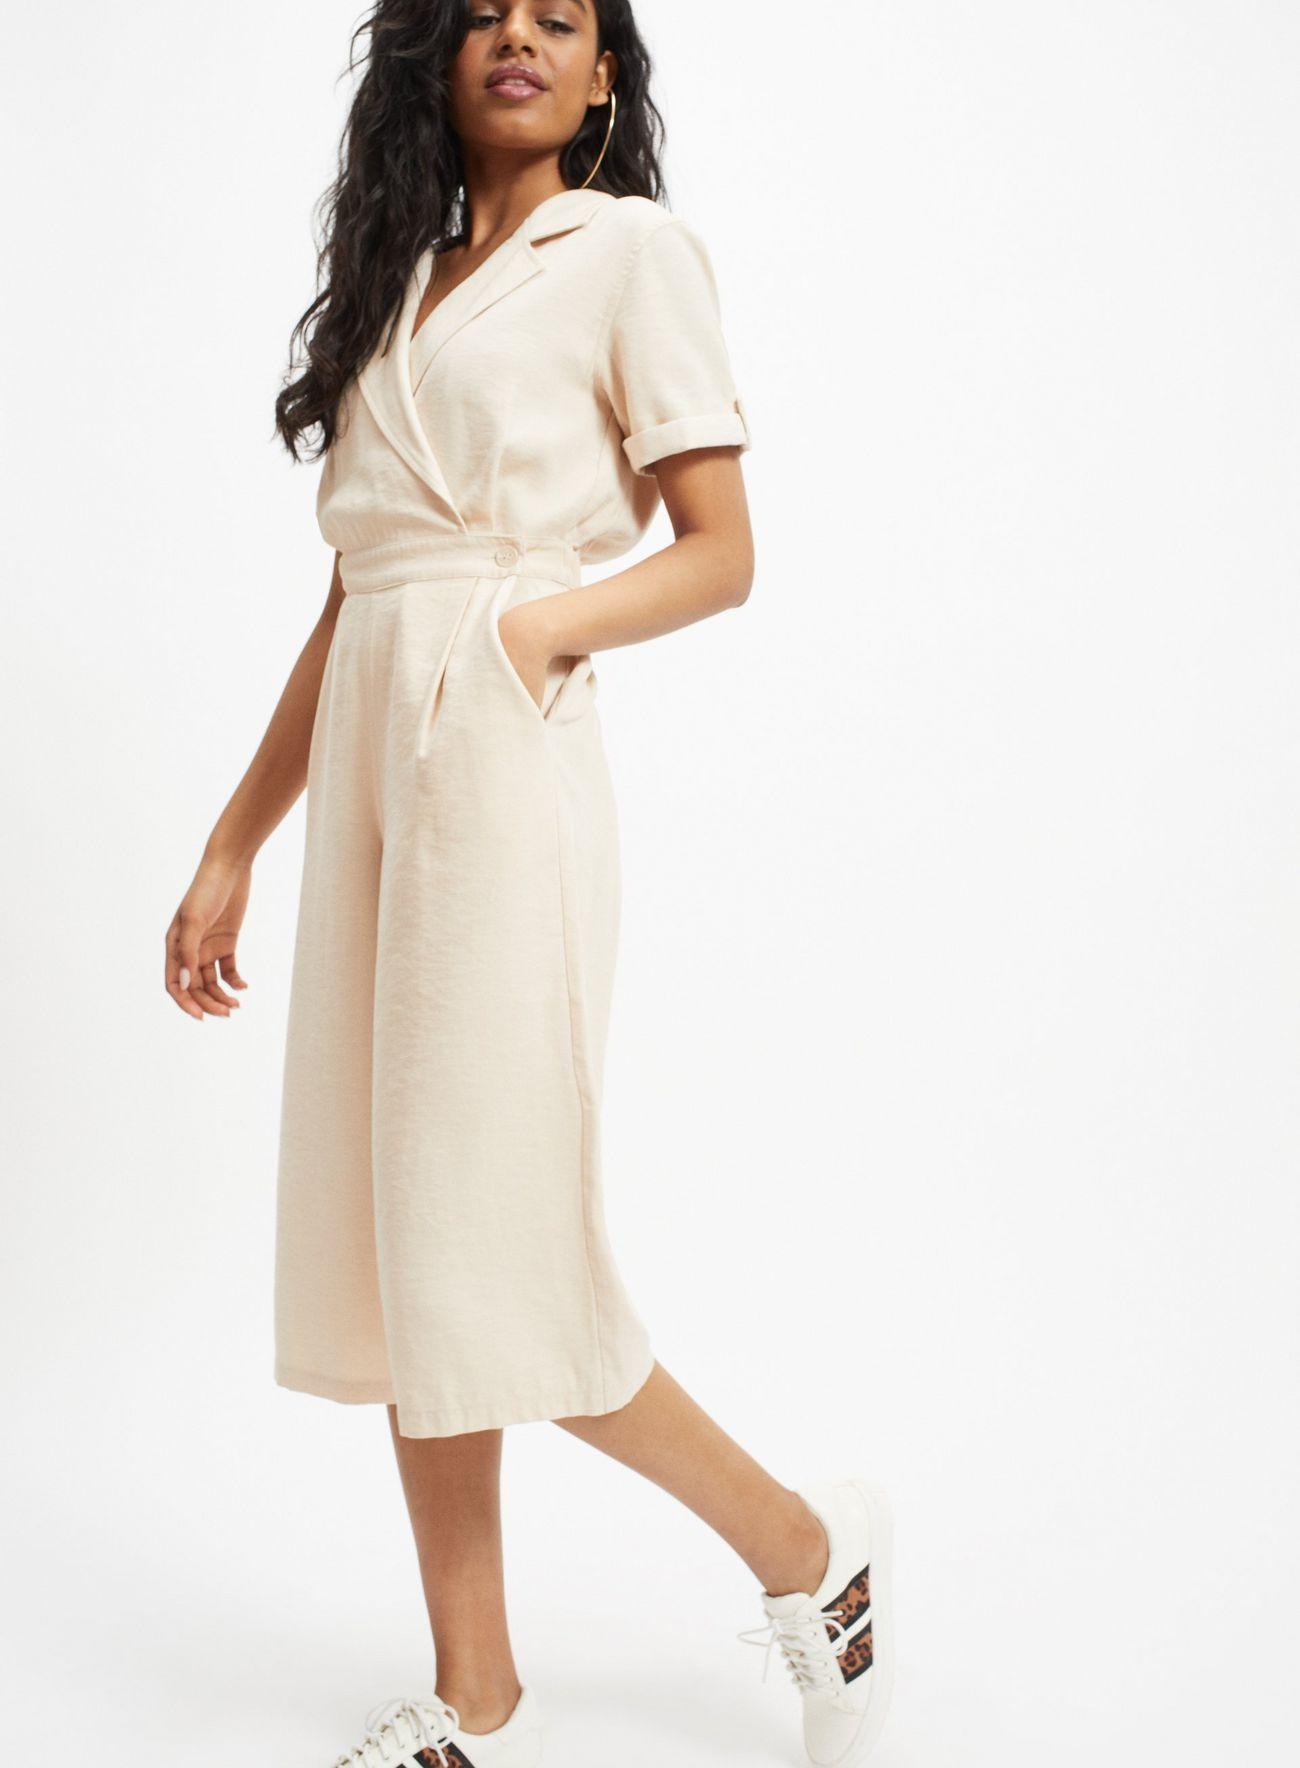 f7d647c24989b PETITE Ivory Tencel Utility Jumpsuit in 2019   Fashion Under £50   Dresses,  Dresses for work, Fashion